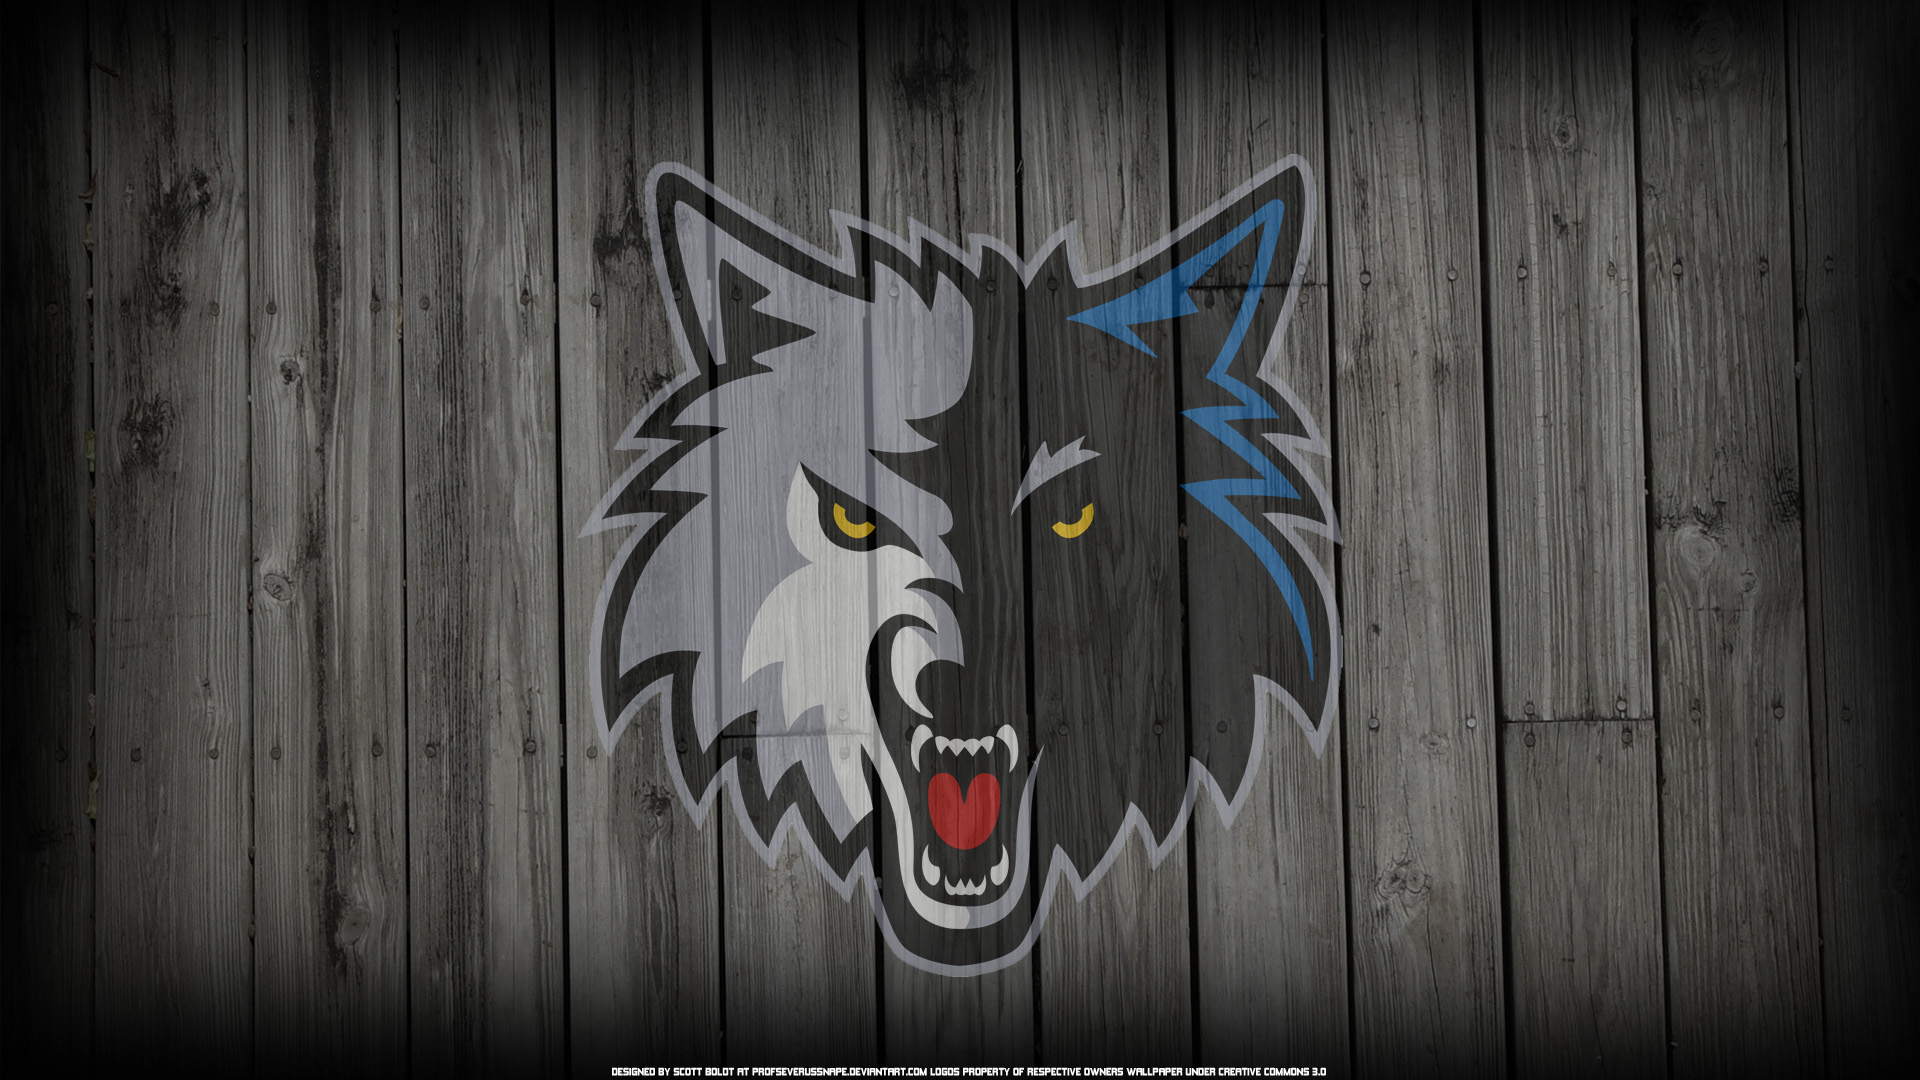 Minnesota Timberwolves Hd Wallpaper Background Image 1920x1080